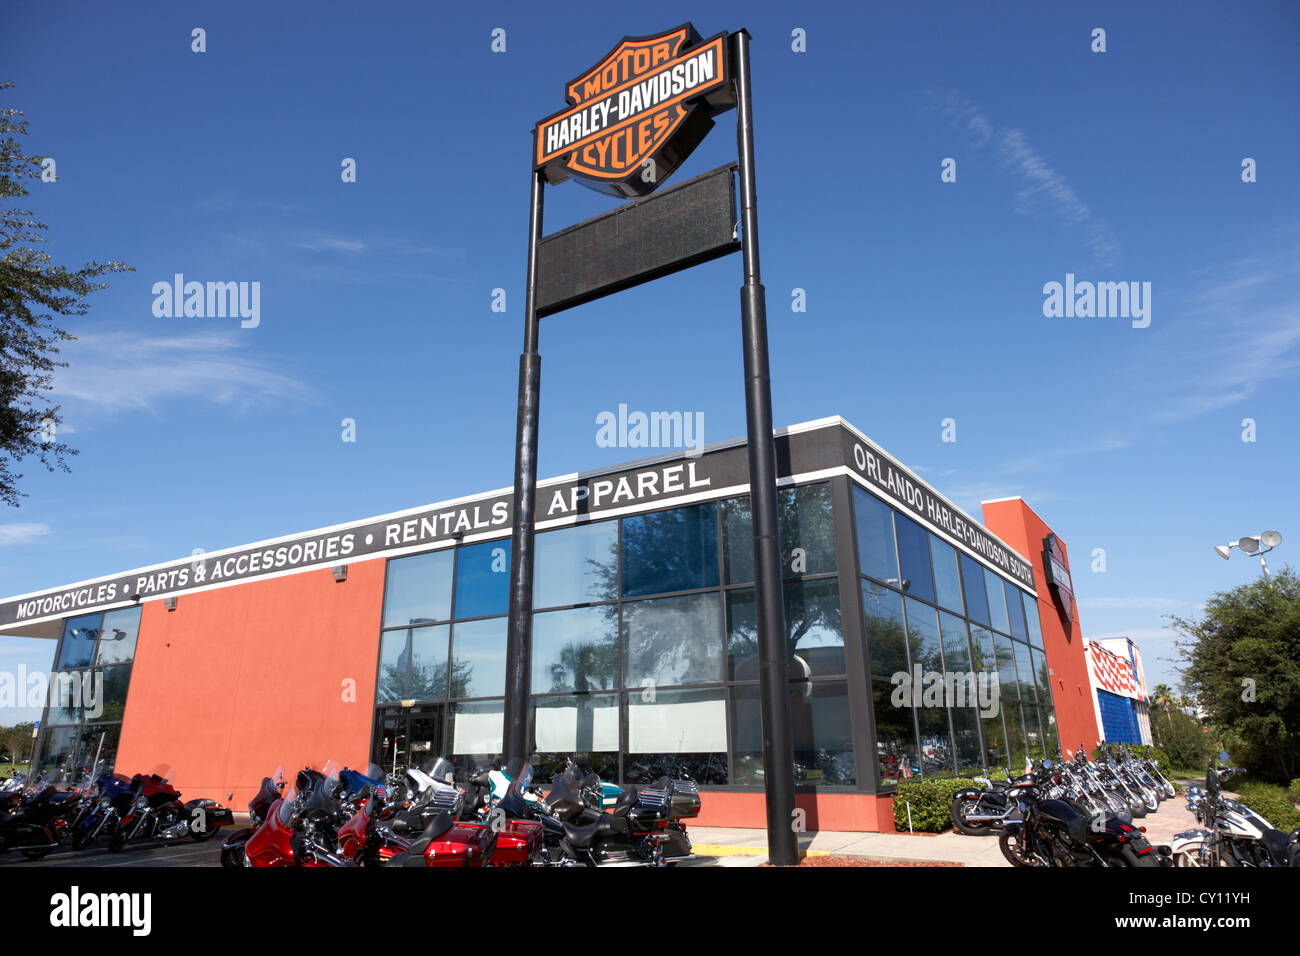 harley davidson dealership orlando florida usa Stock Photo